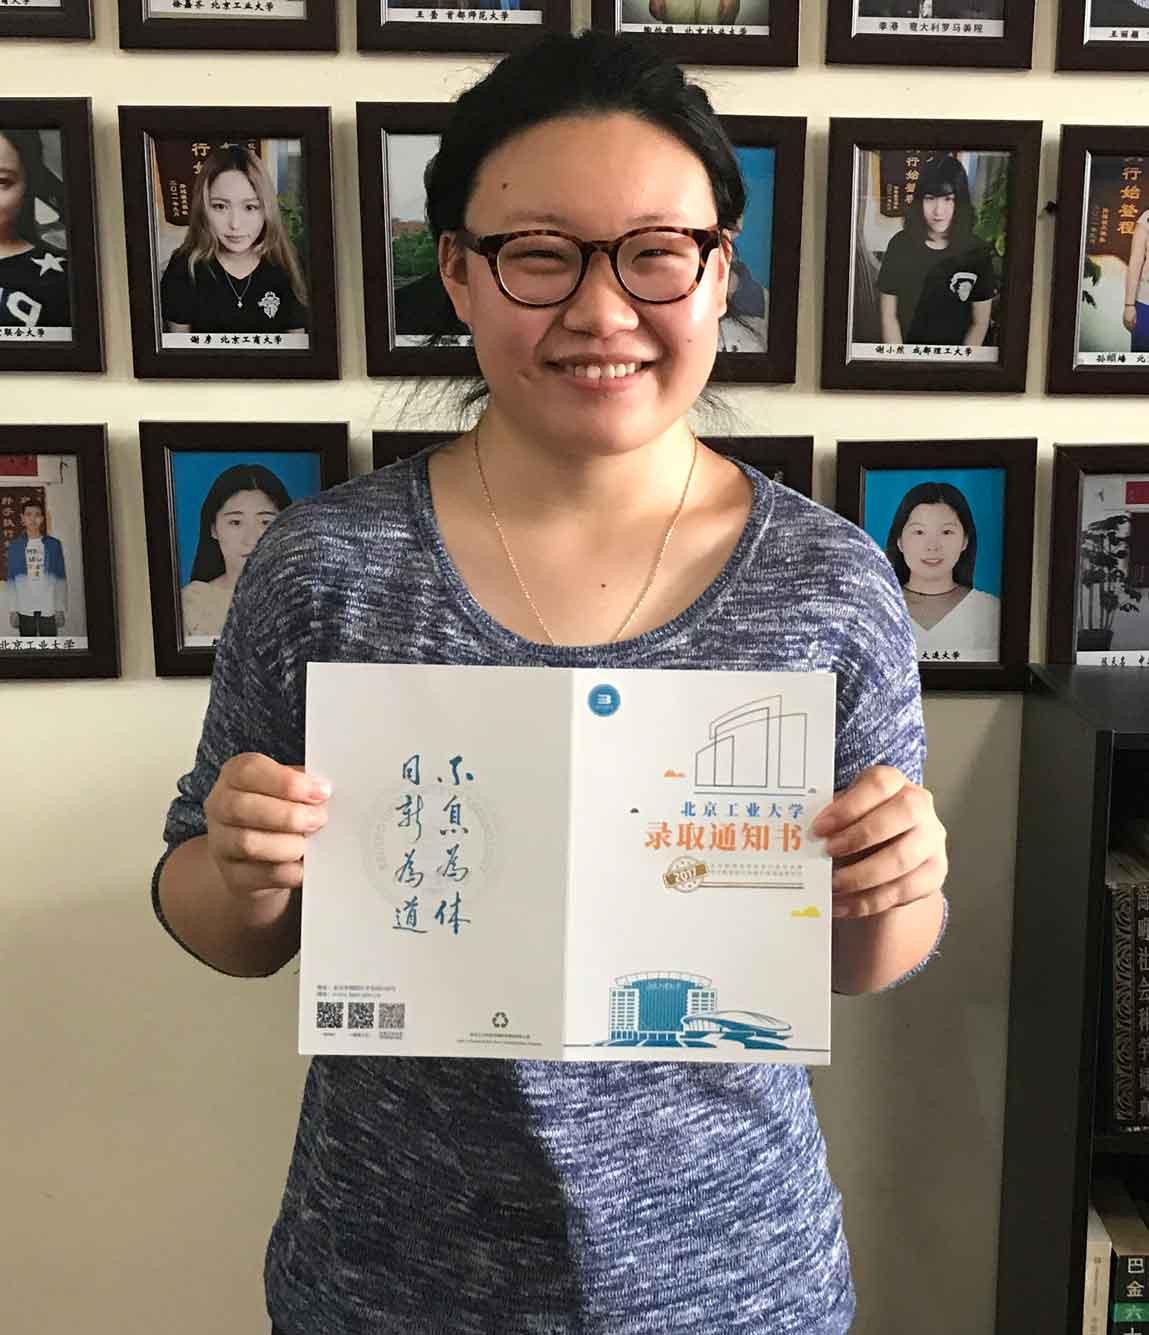 title='李婧亦  北京工业大学'